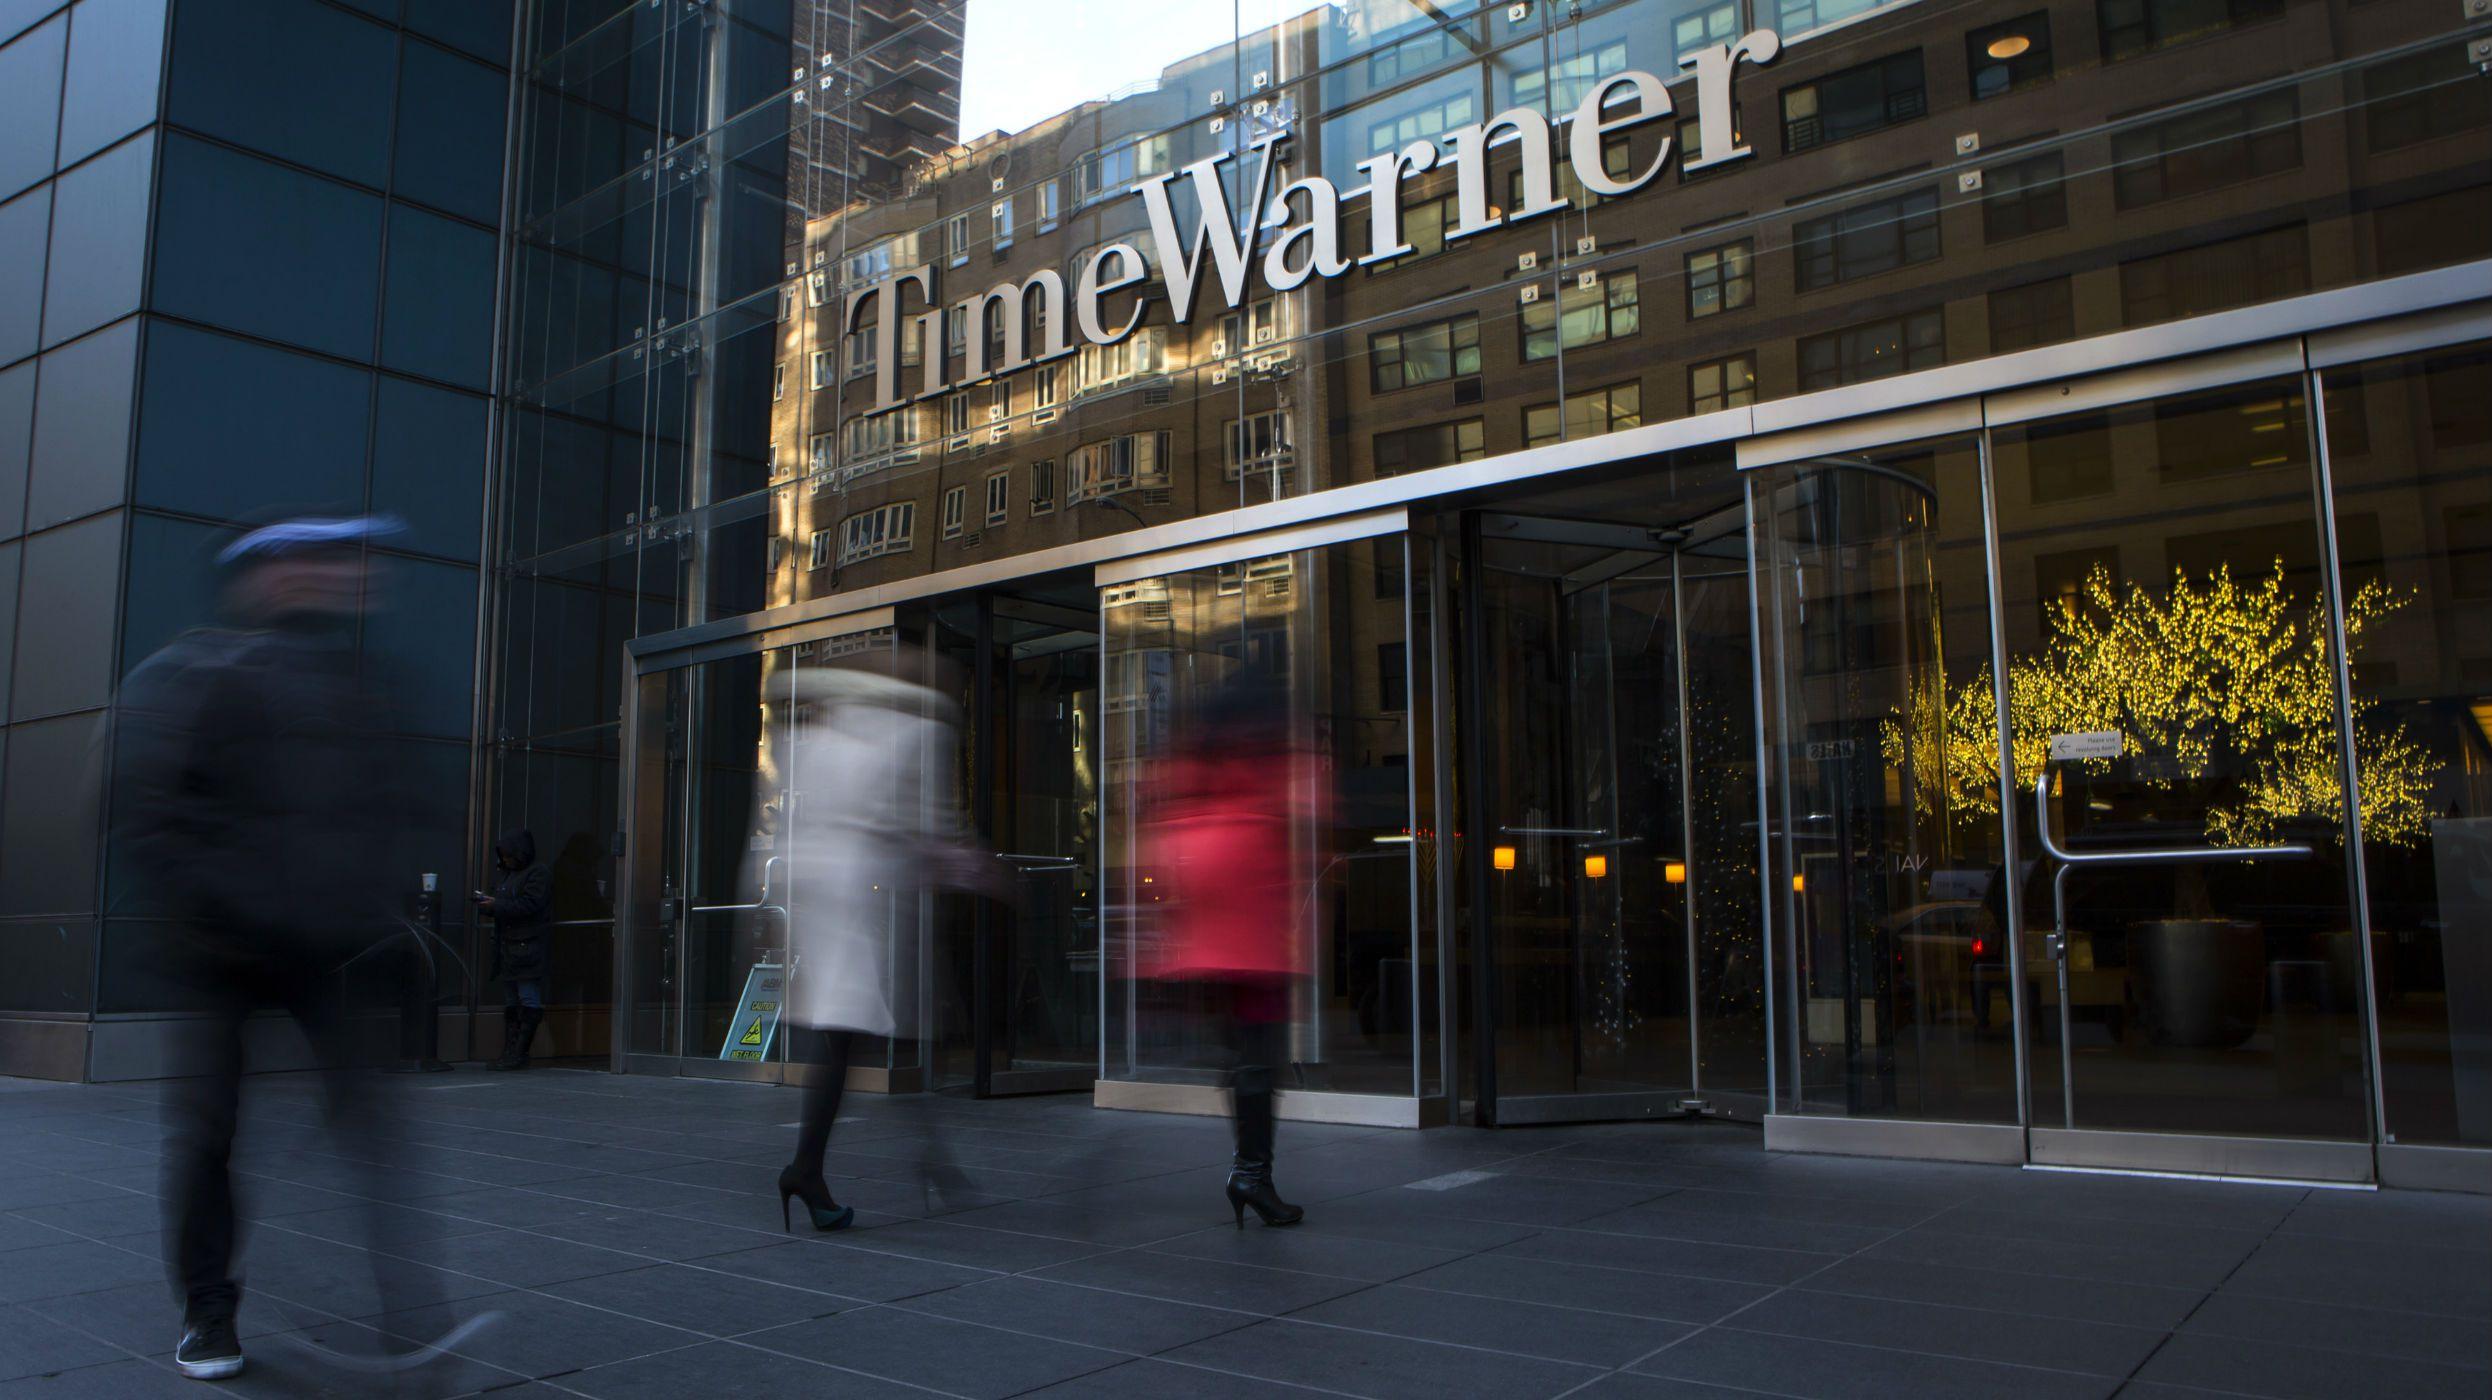 The Time Warner building in New York, December 11, 2013.